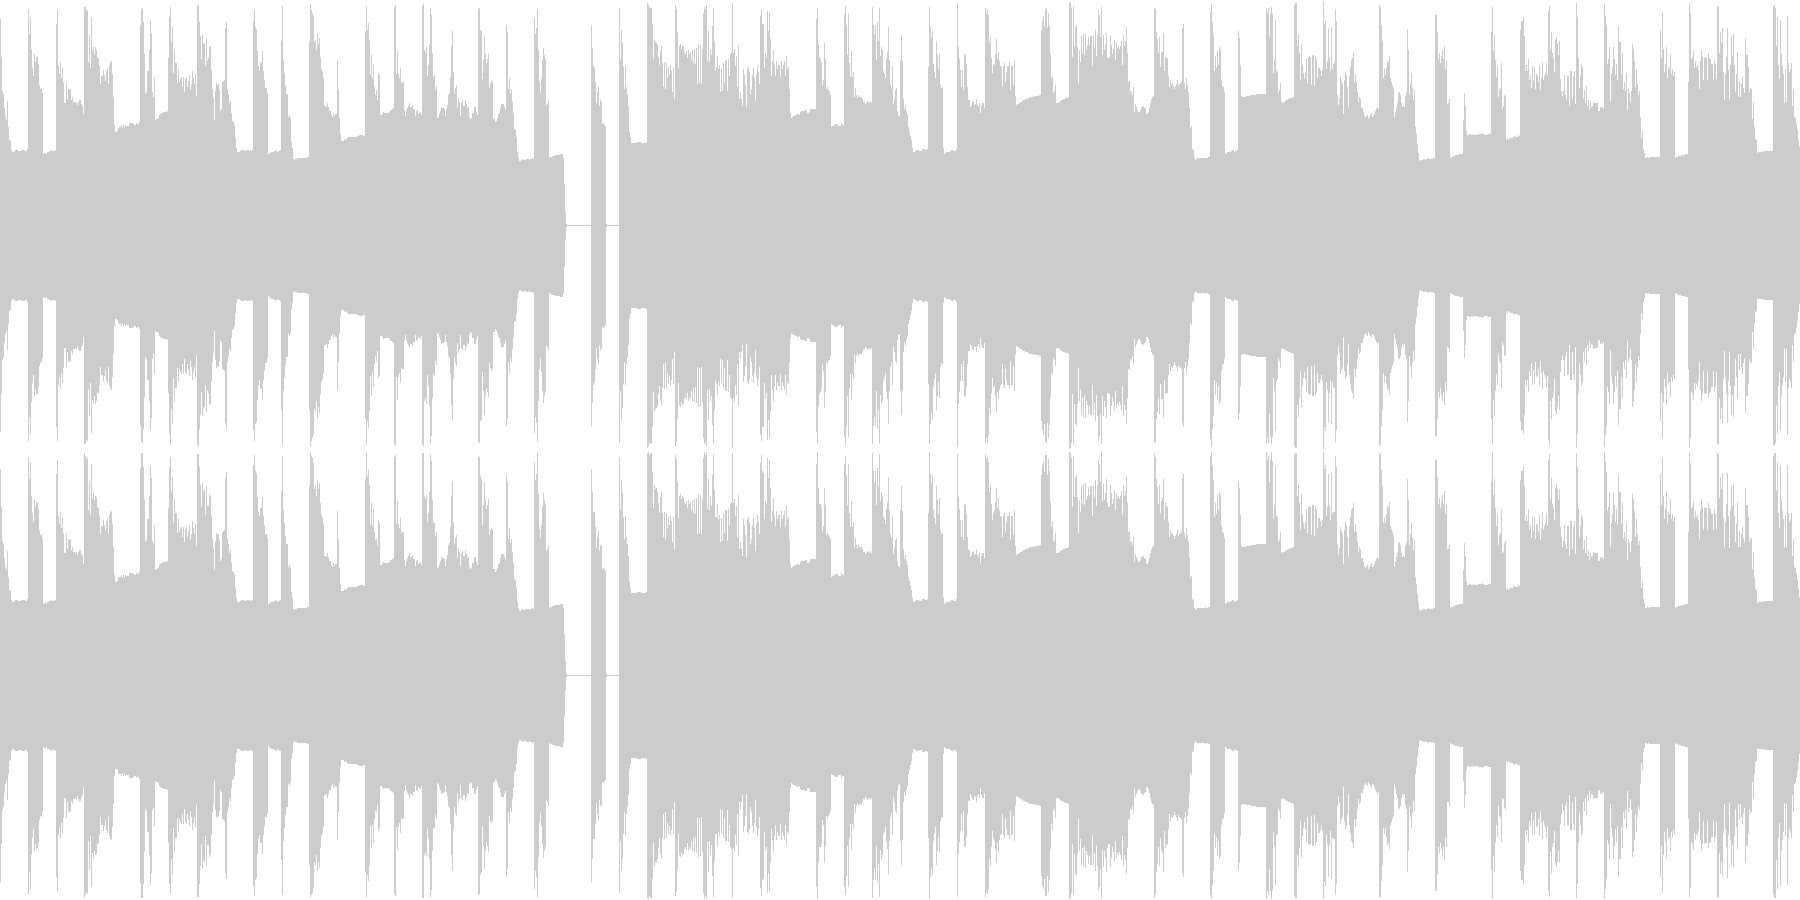 8Bitレトロゲーのんびりスカ風インストの未再生の波形